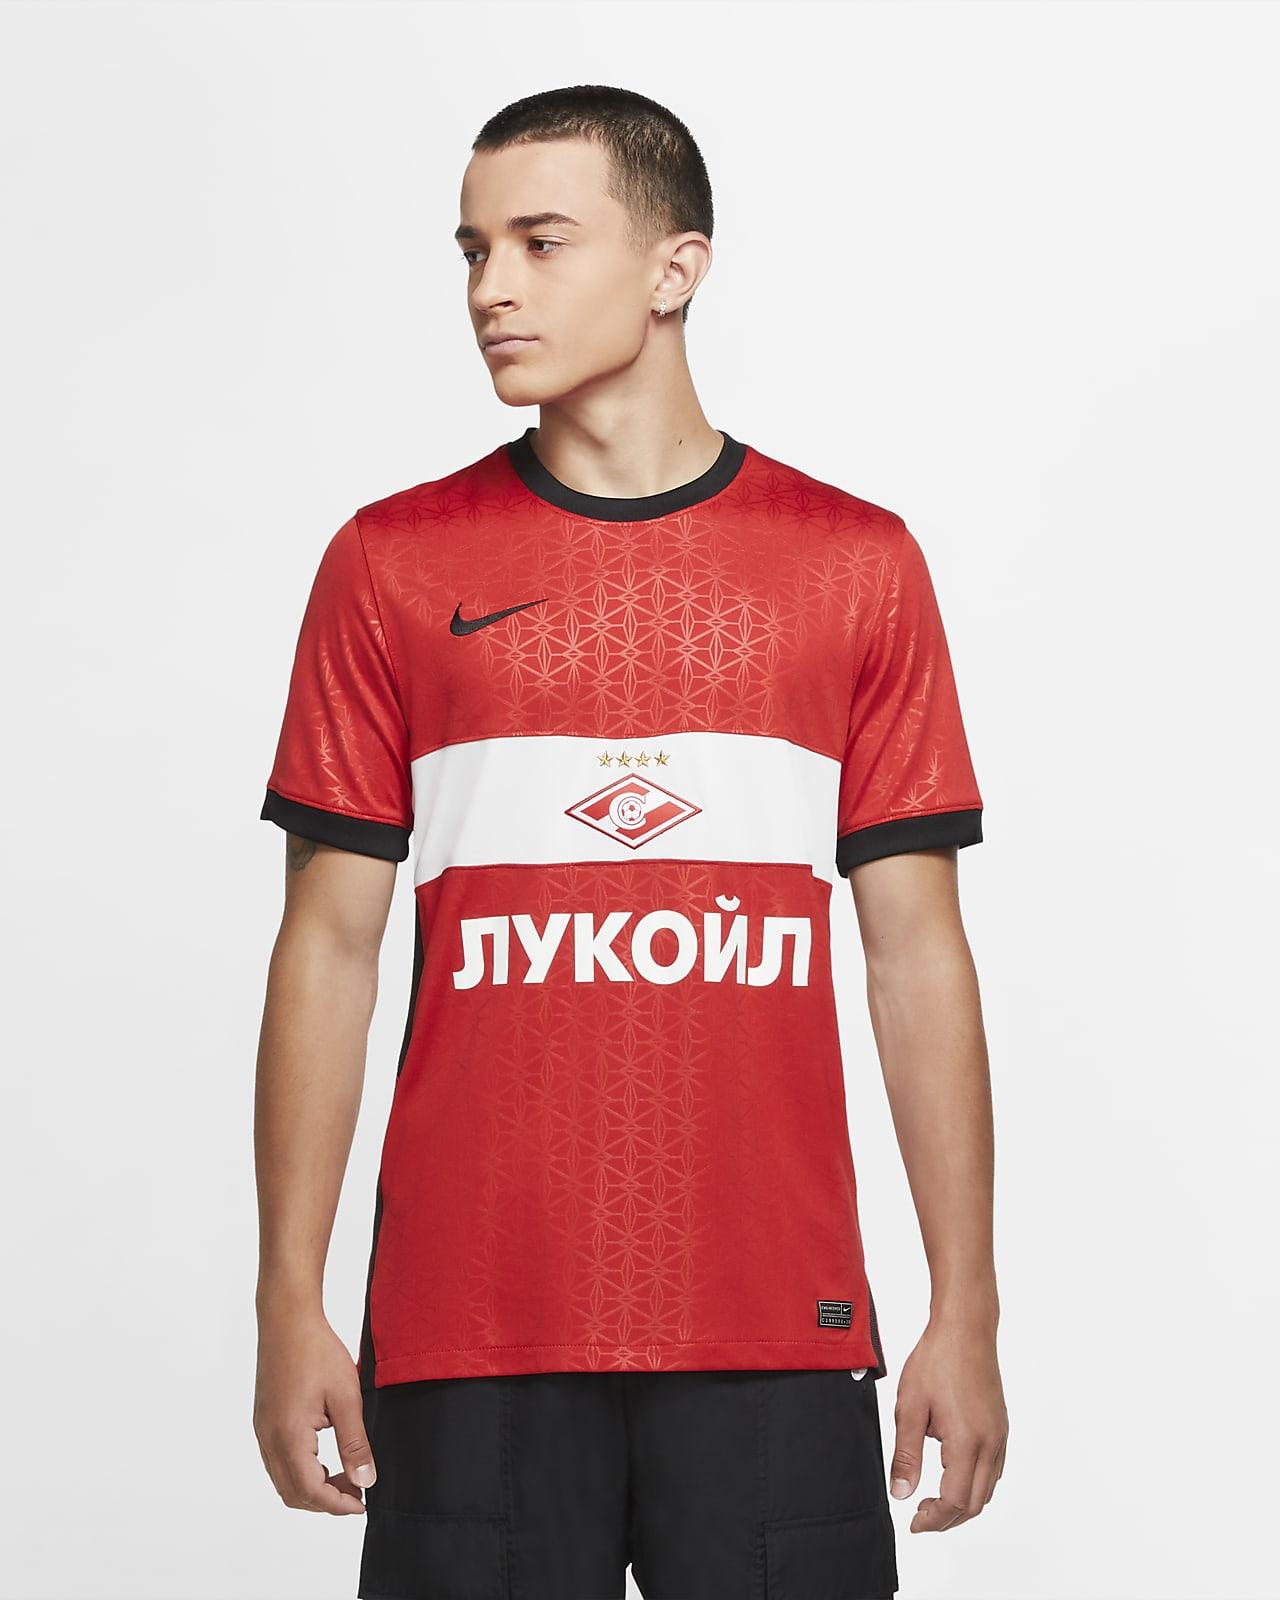 Spartak Moskou 2020/21 Stadium Thuis Voetbalshirt voor heren